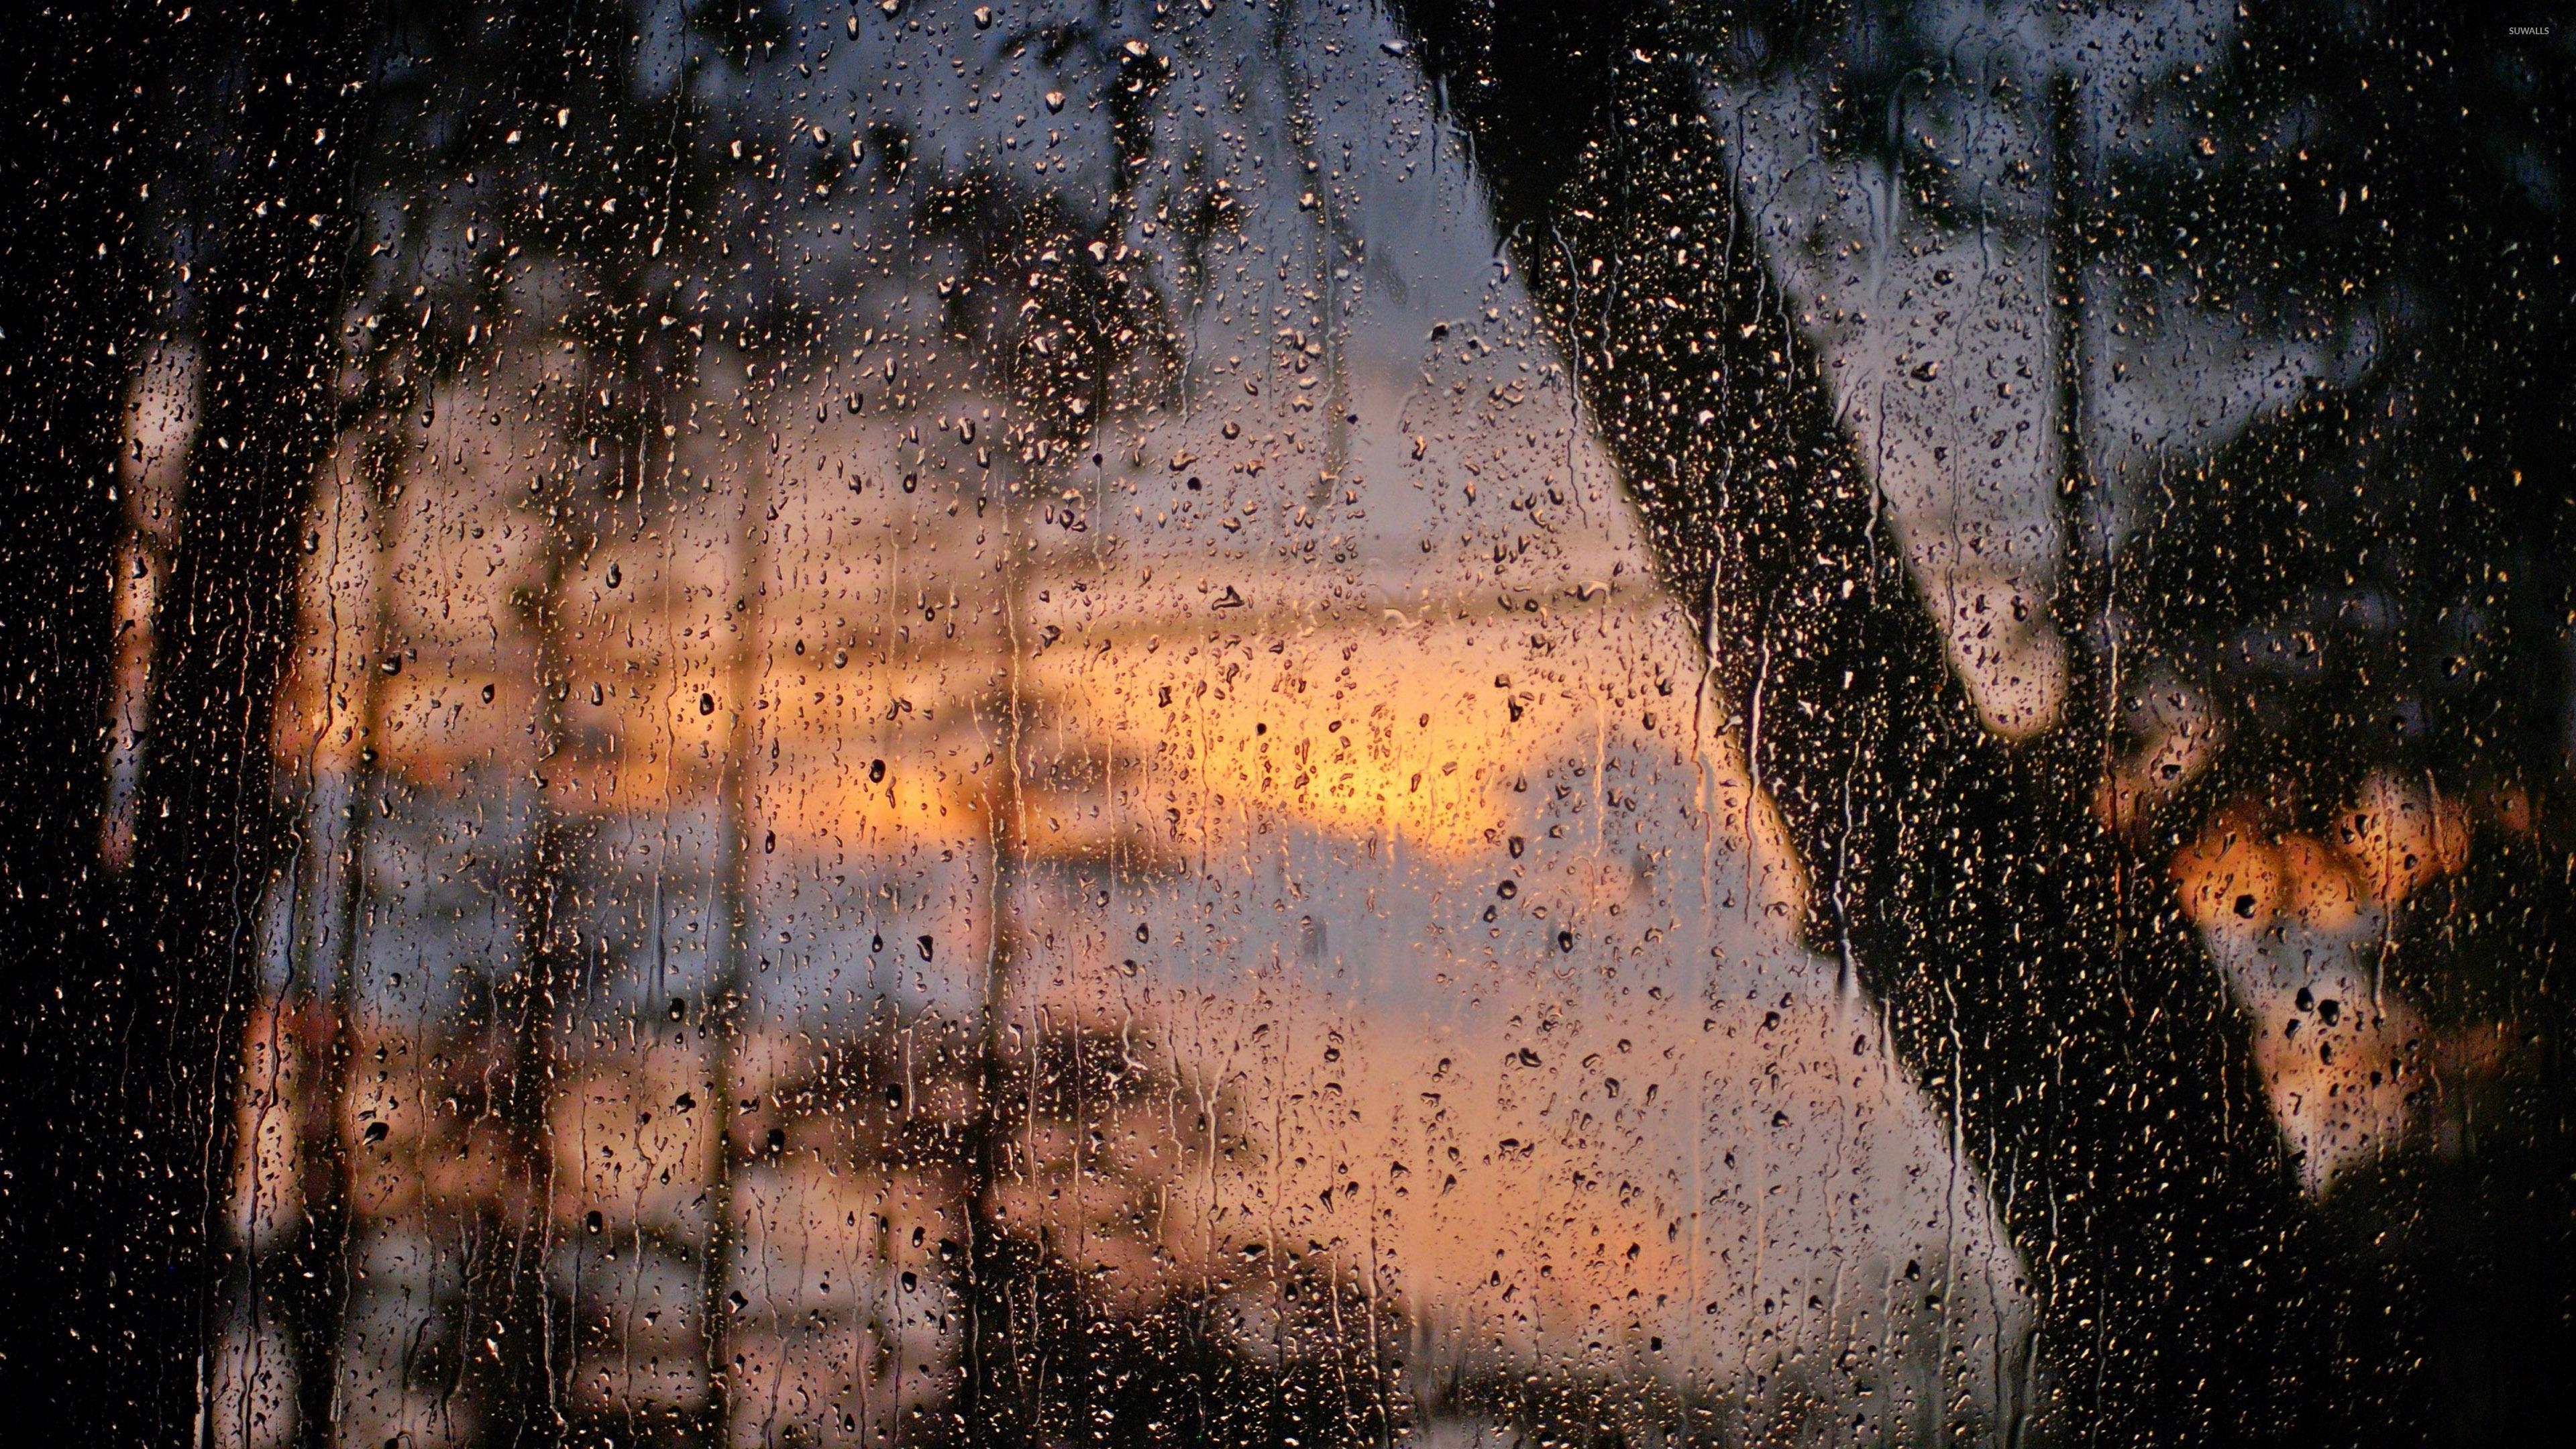 rain drops on window wallpaper photography wallpapers 38154. Black Bedroom Furniture Sets. Home Design Ideas